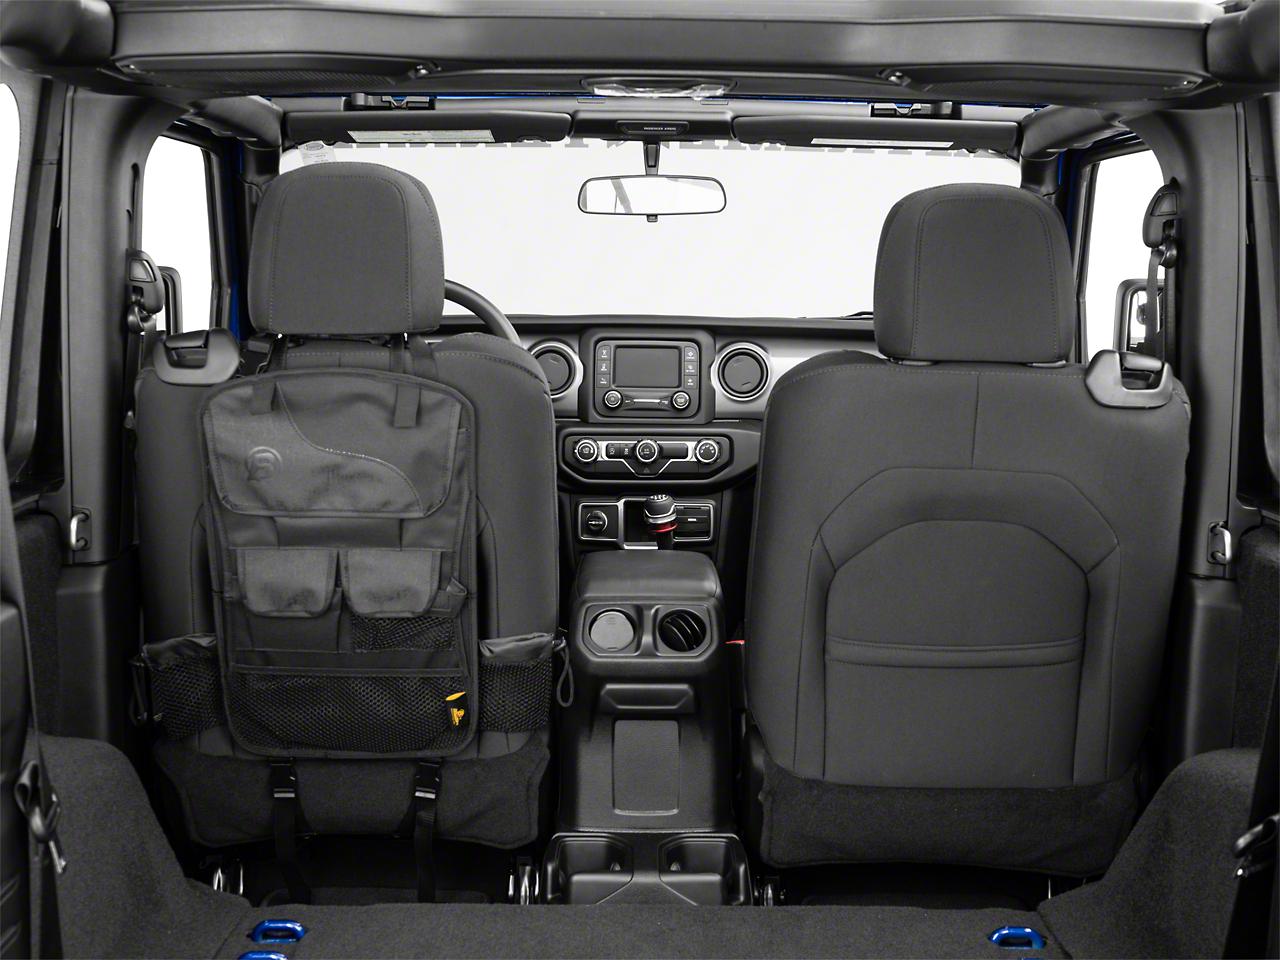 Bestop RoughRider Seat Back Storage Organizer (87-18 Jeep Wrangler YJ, TJ & JK)